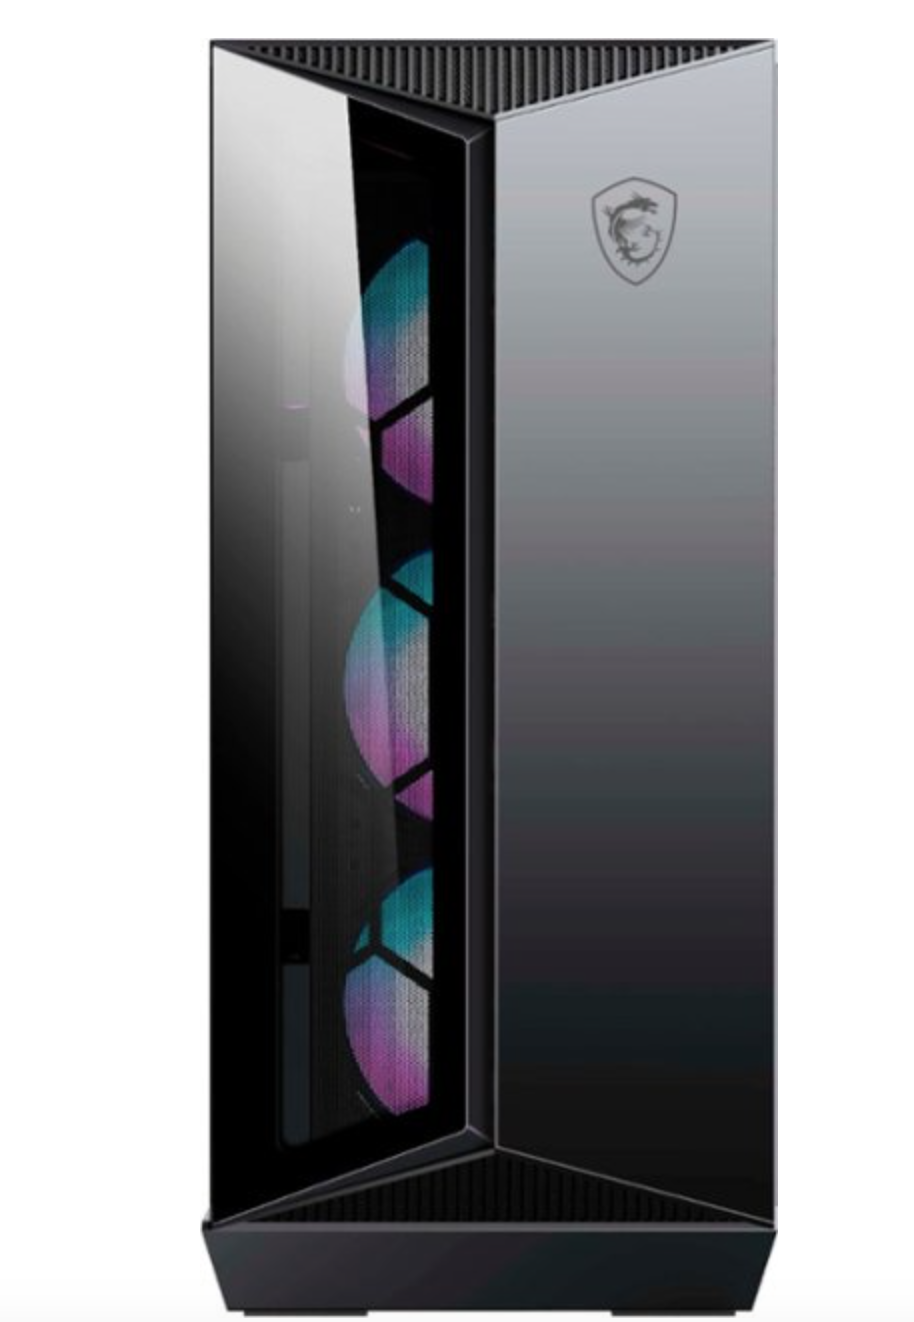 MSI - Aegis RS Gaming Desktop - Intel Core i7-11700KF - 16GB Memory - NVIDIA GeForce RTX 3080 - 1TB SSD $2299